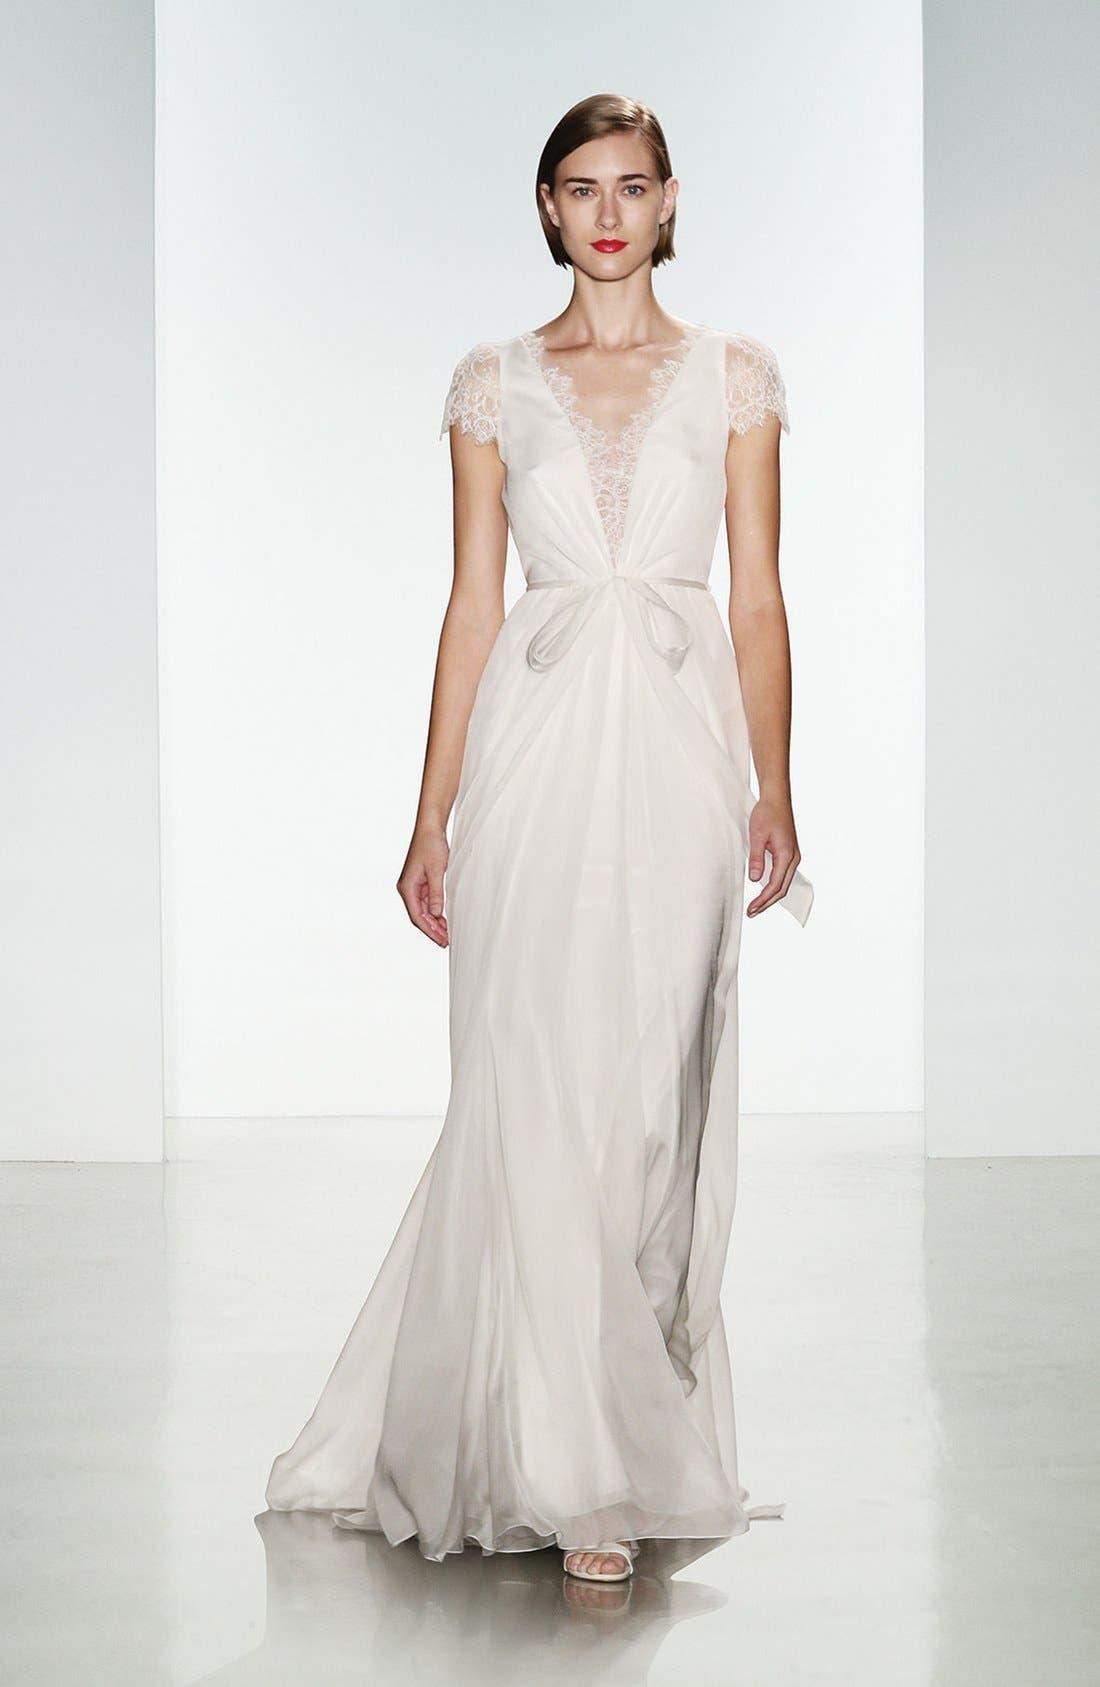 Lainee Silk Chiffon & Lace Cap Sleeve Gown,                             Alternate thumbnail 4, color,                             900